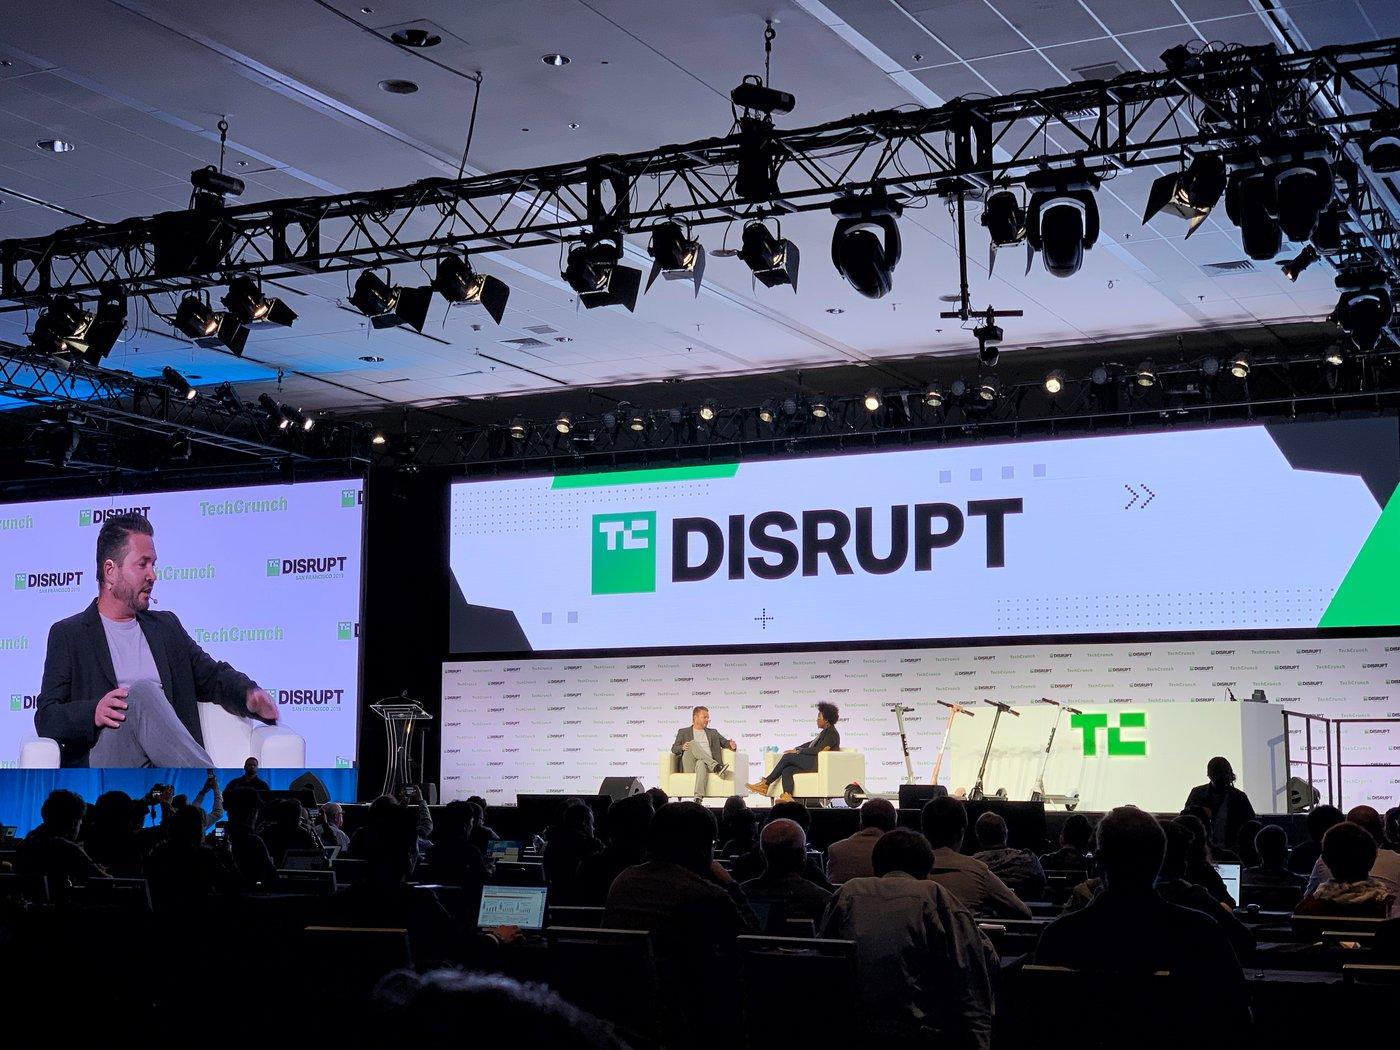 TC Disrupt2019现场, 左起:Travis VanderZanden、TechCrunch记者Megan Rose Dickey、Bird的多款电动滑板车